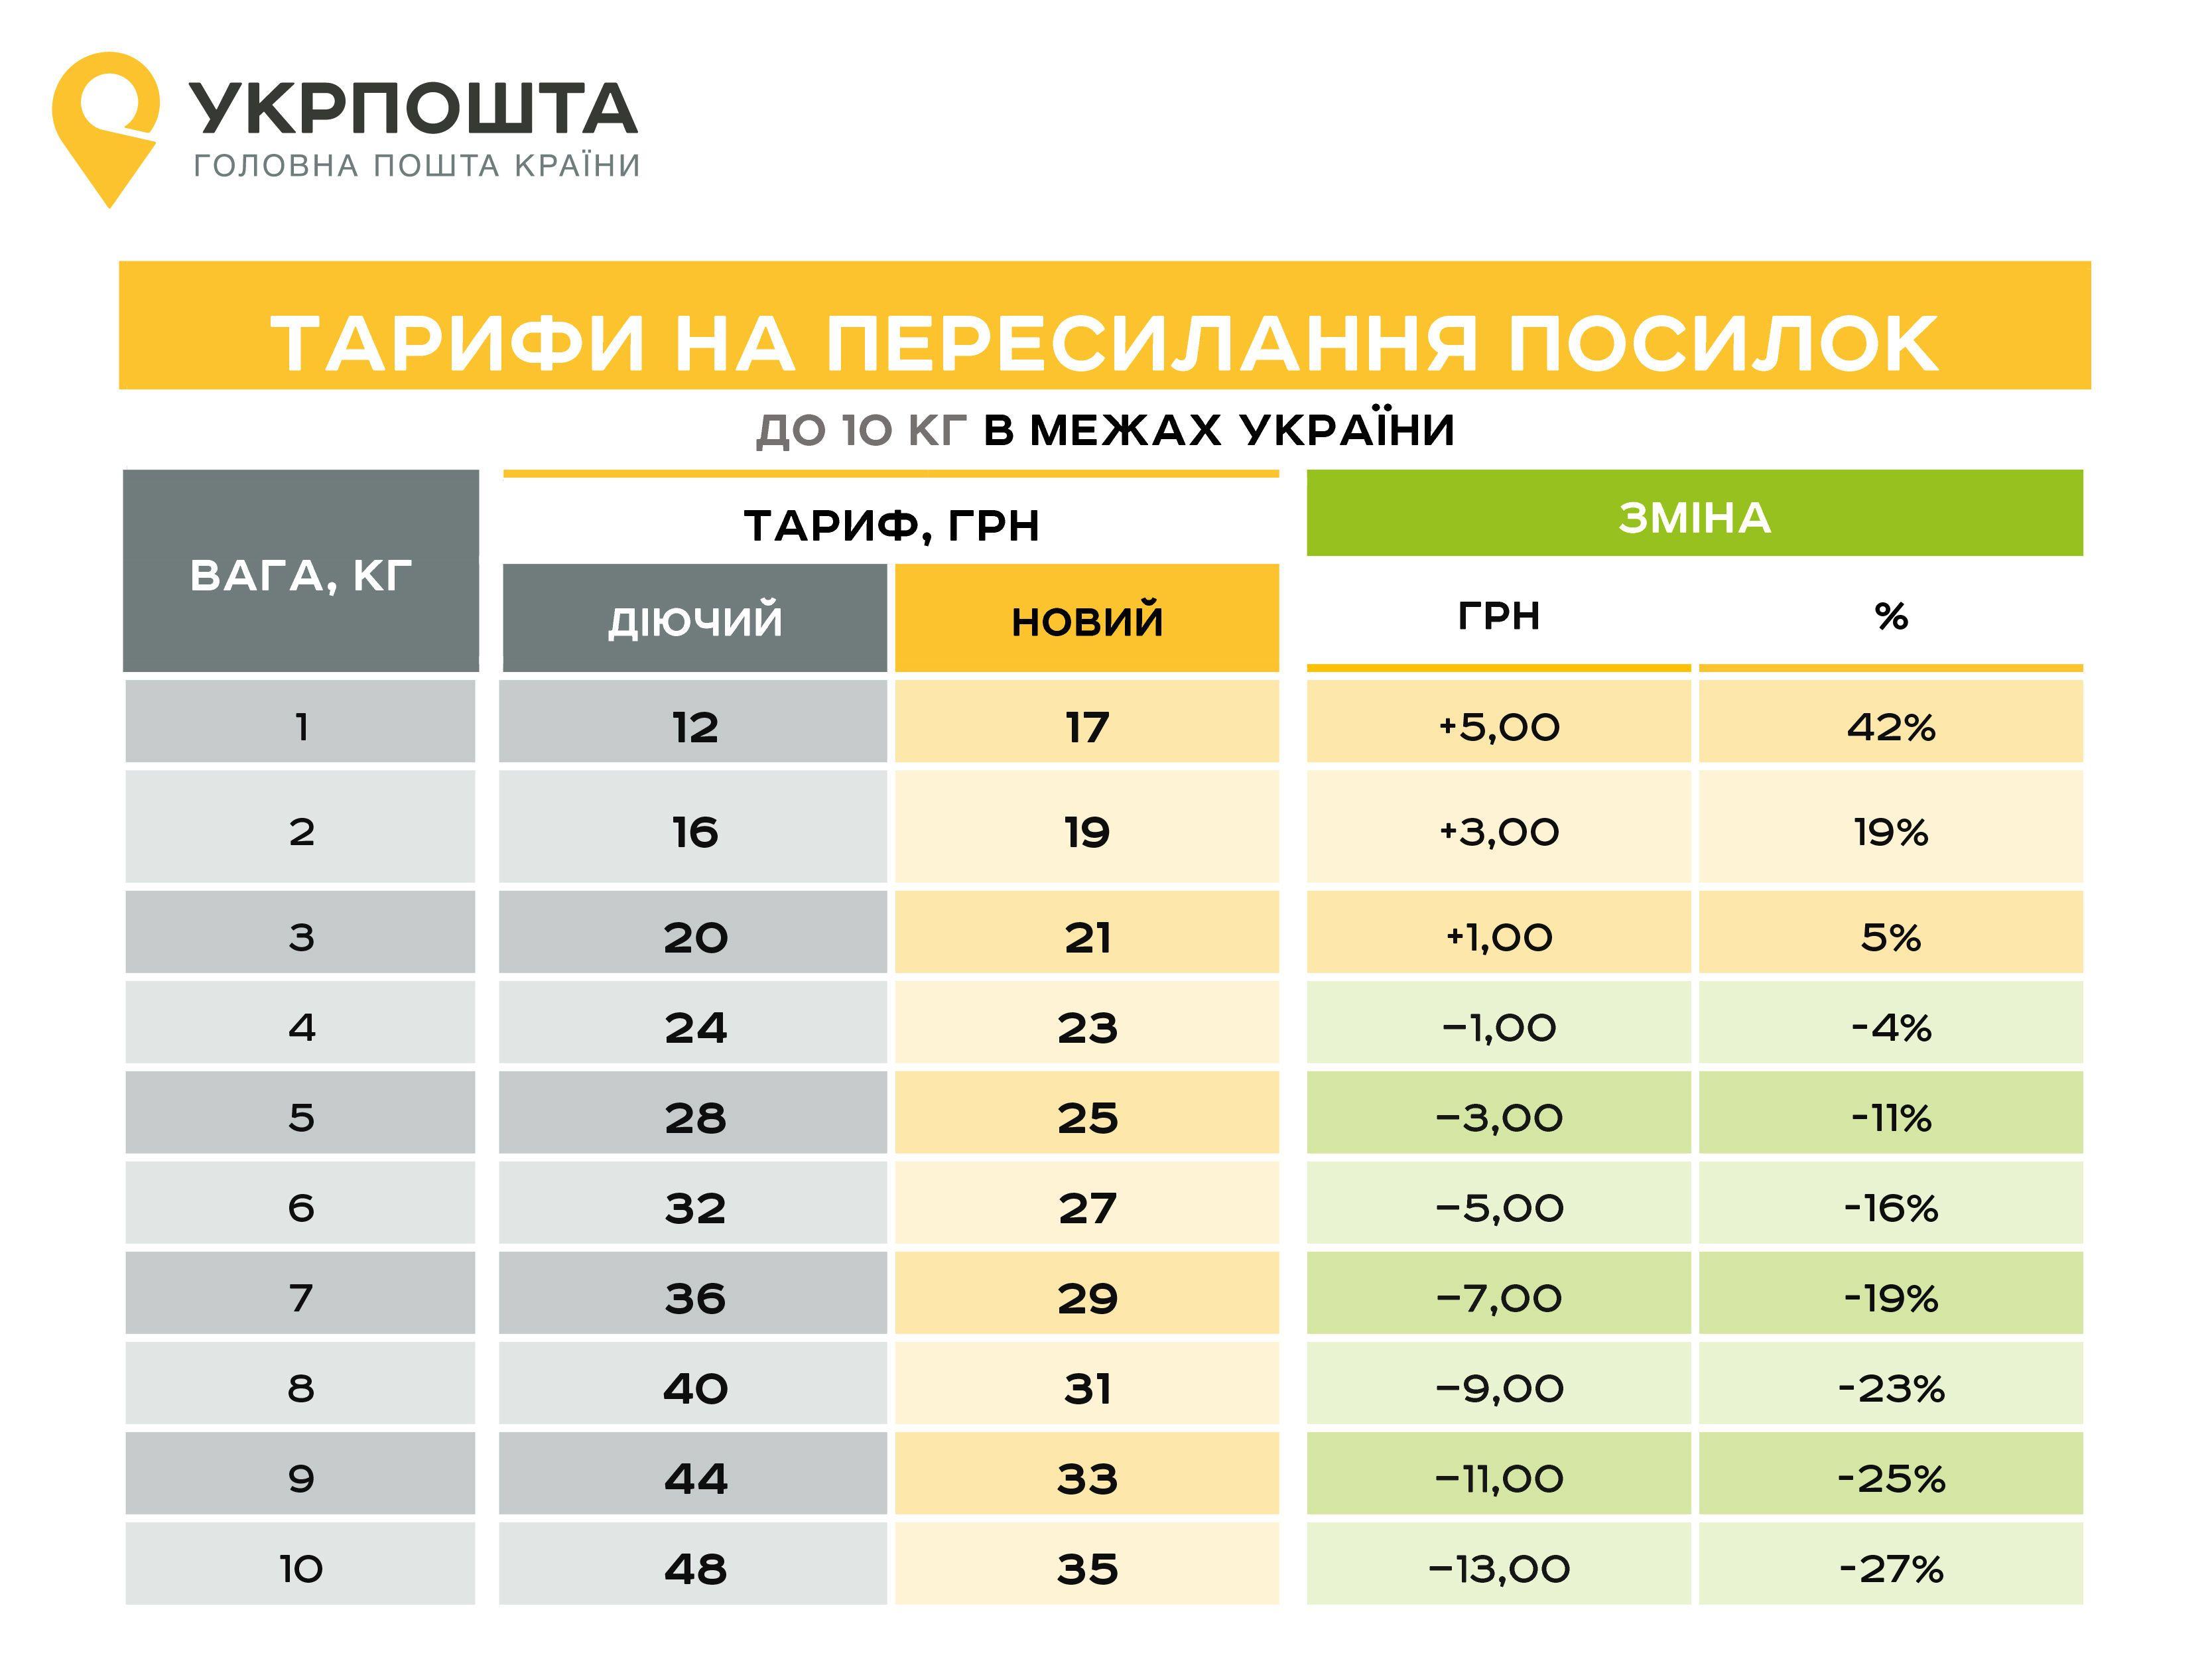 тарифи Укрпошта_2